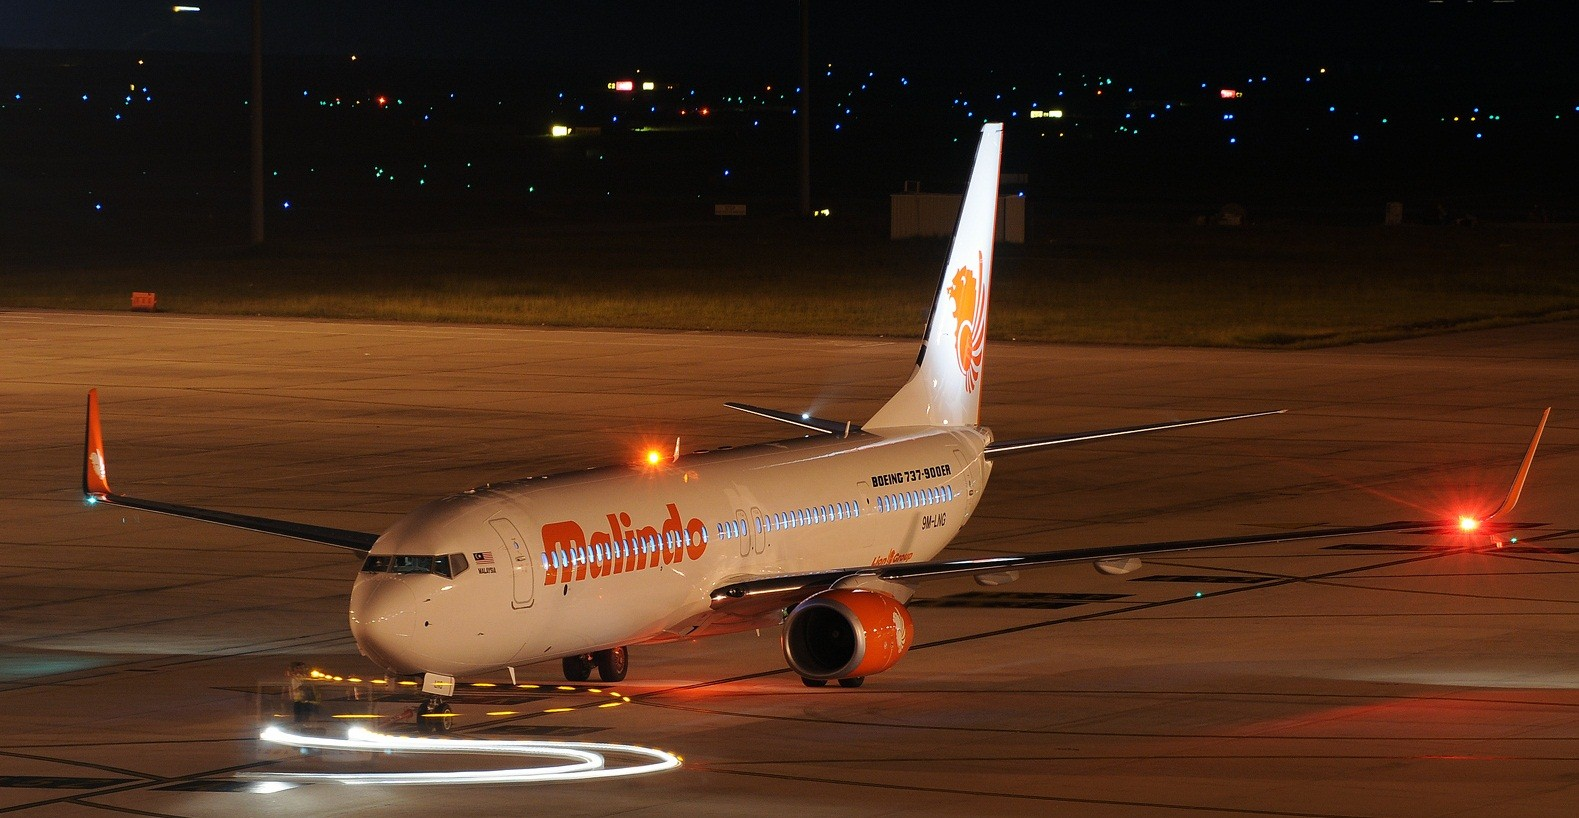 Malindo Air: Ricky's Memoirs: Malindo Air To Start KL-New Delhi